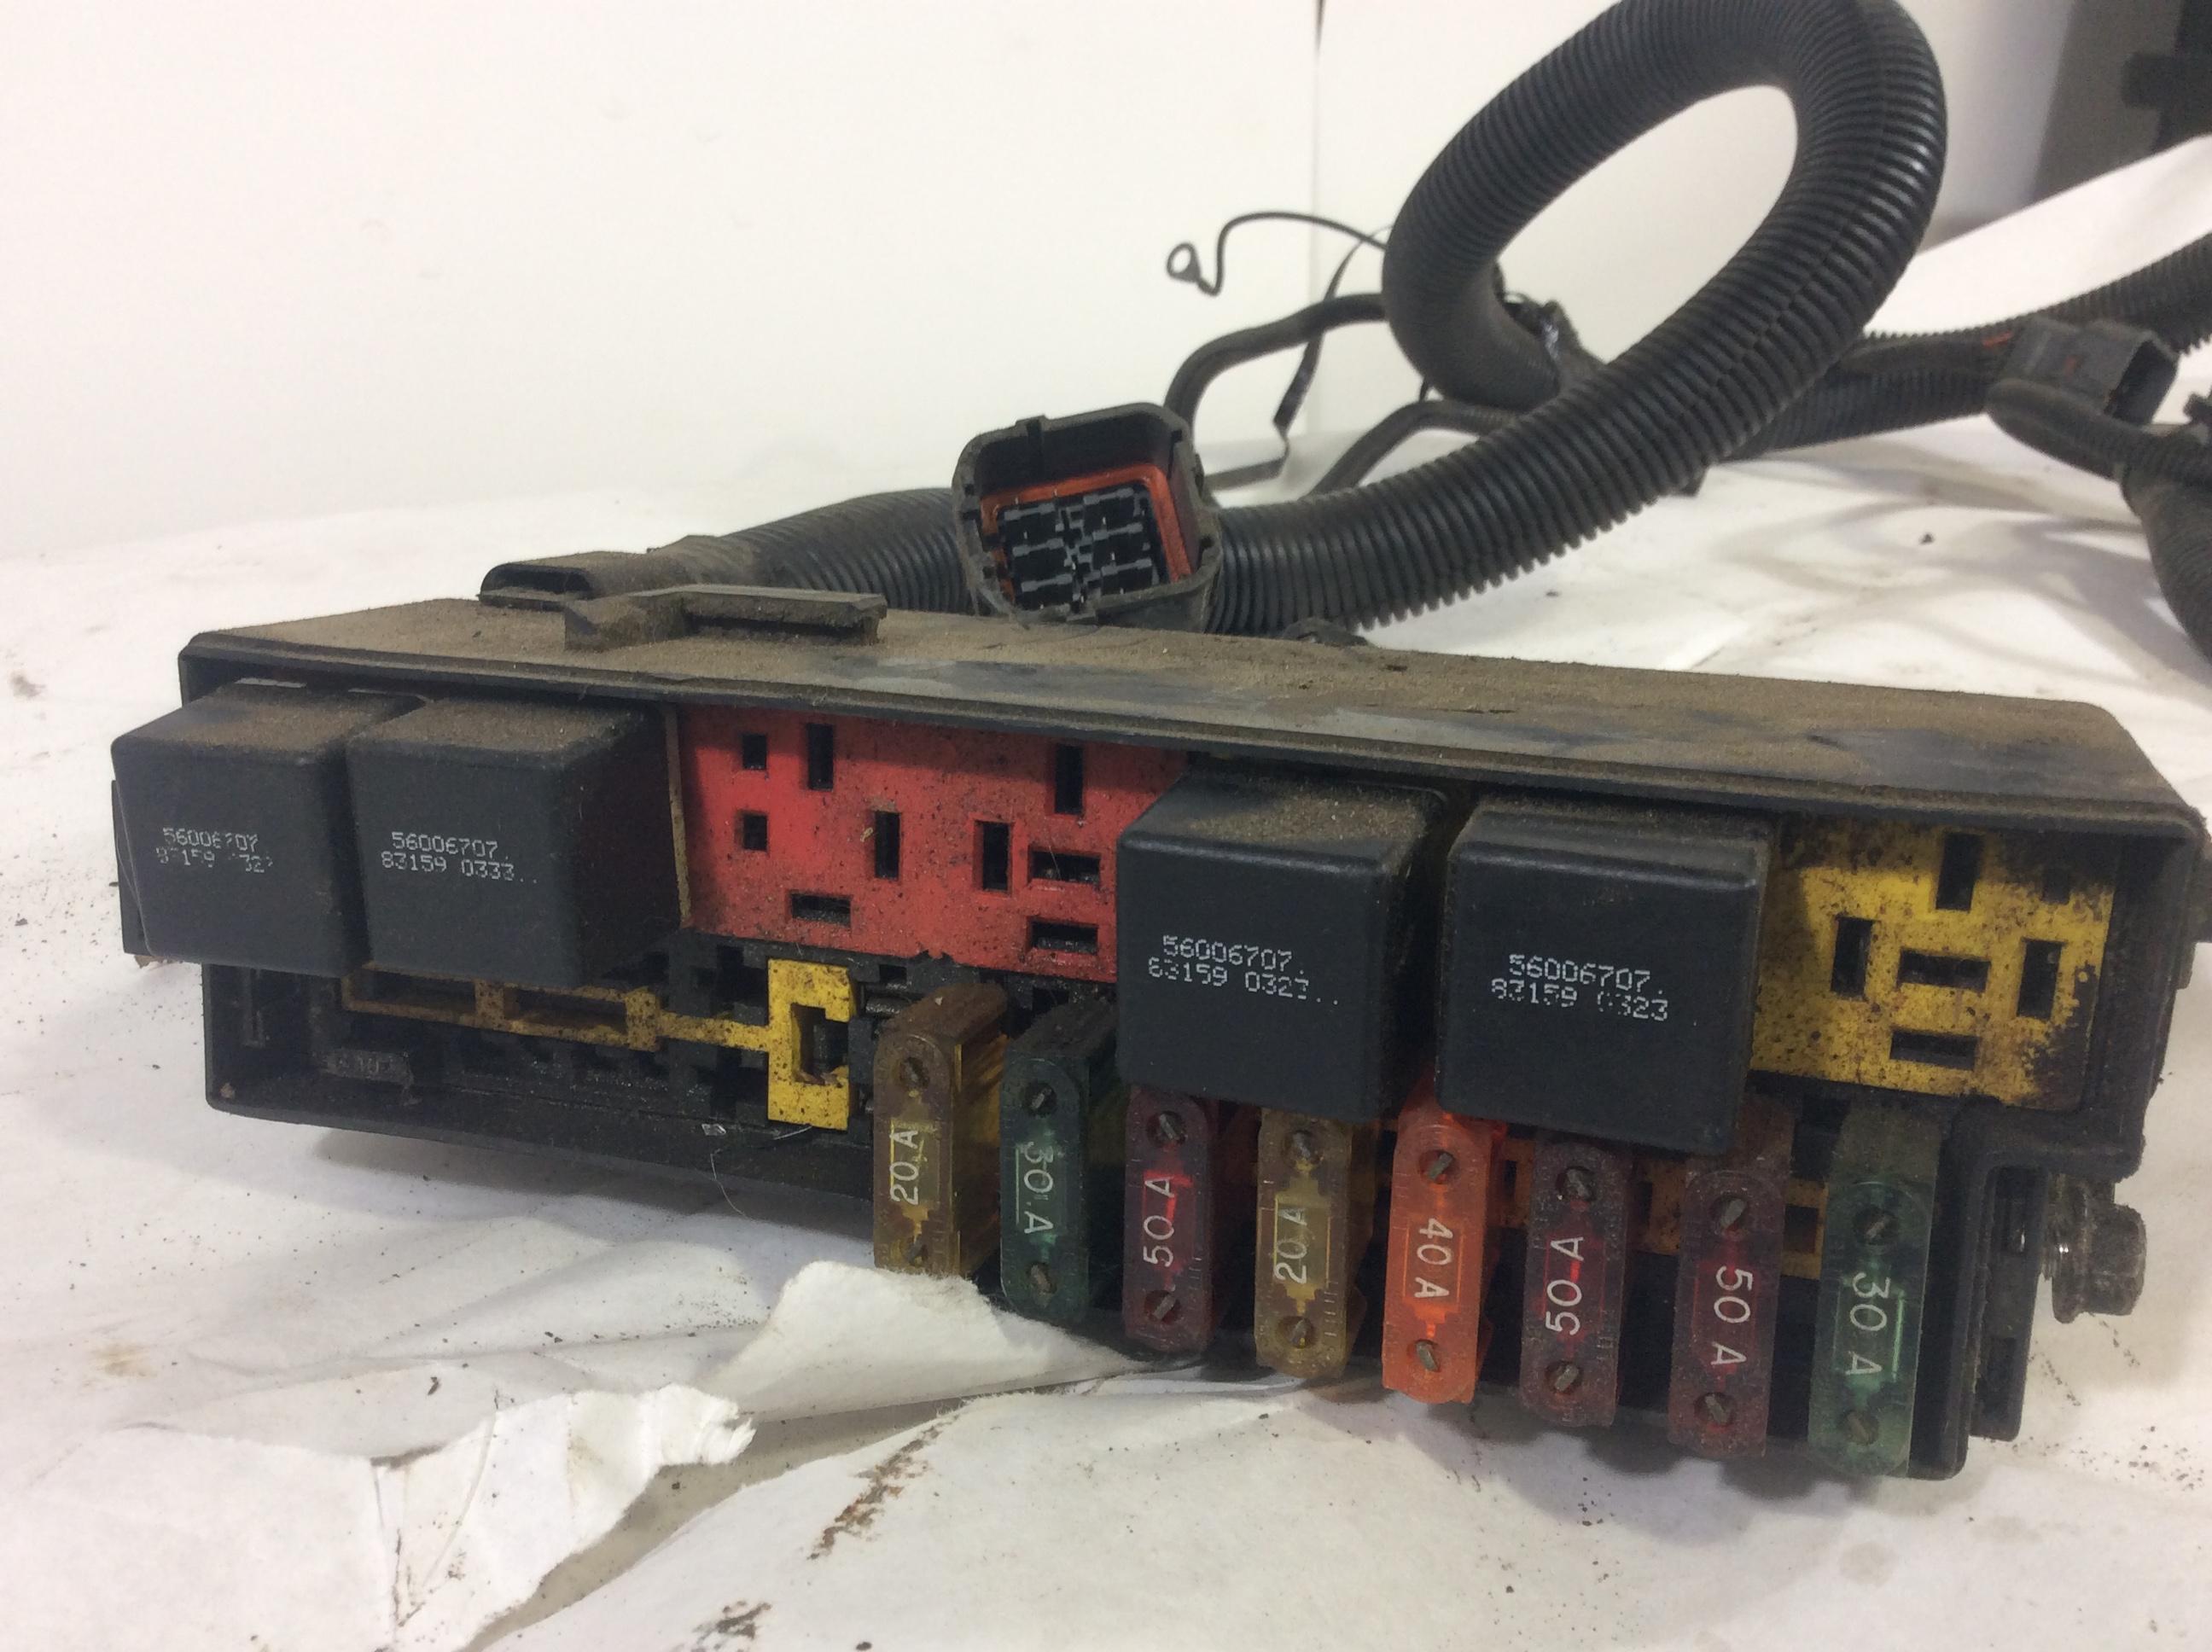 [DIAGRAM_5FD]  HF_3917] 1990 Jeep Yj Fuse Box Download Diagram | Fuse Box 1990 Jeep Wrangler |  | Effl Tivexi Xrenket Pneu Rele Mohammedshrine Librar Wiring 101